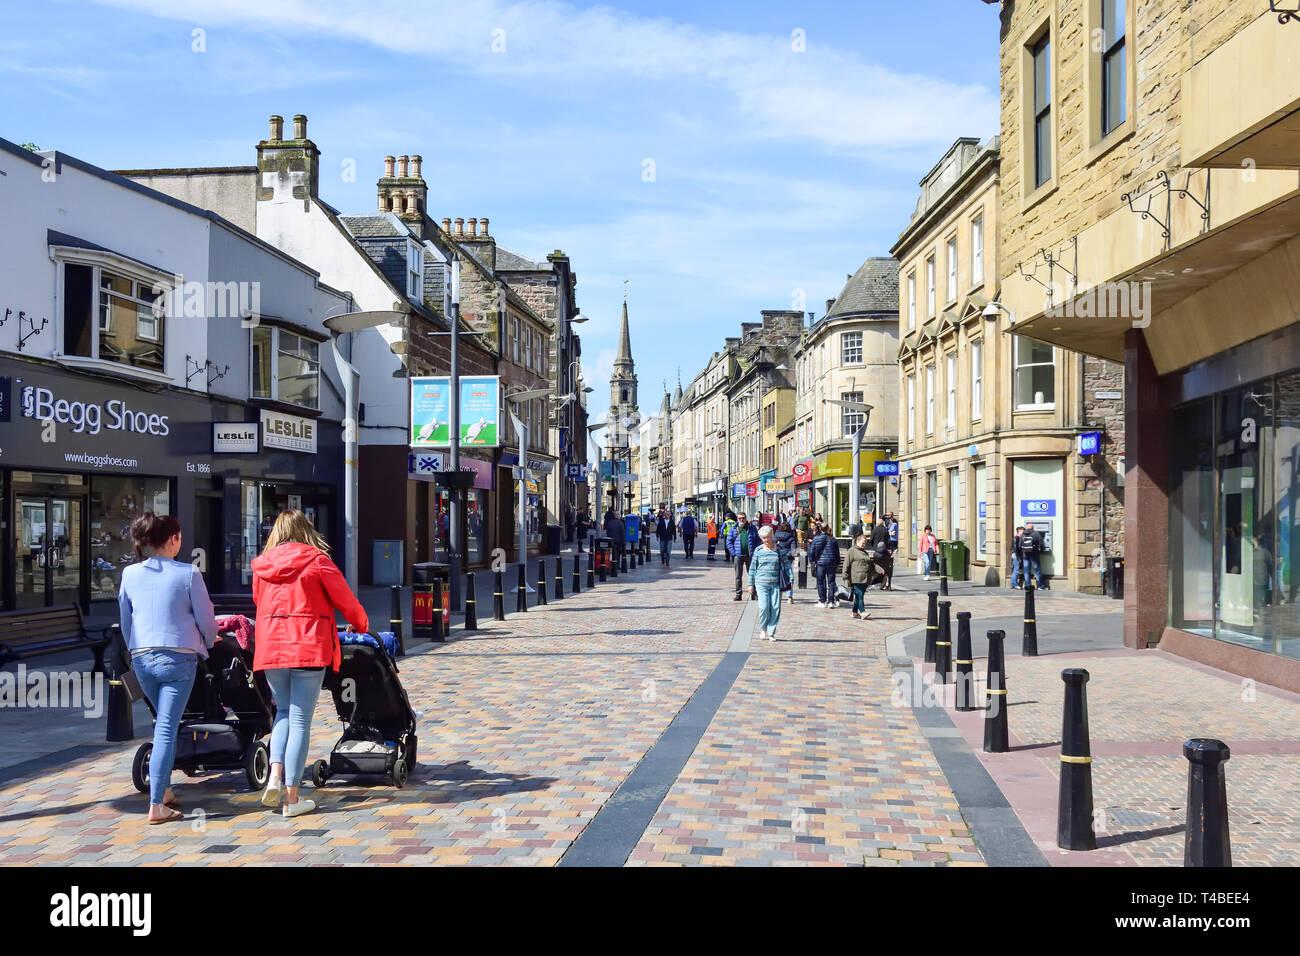 Pedestrianised Eastgate, Inverness, Highland, Scotland, United Kingdom - Stock Image